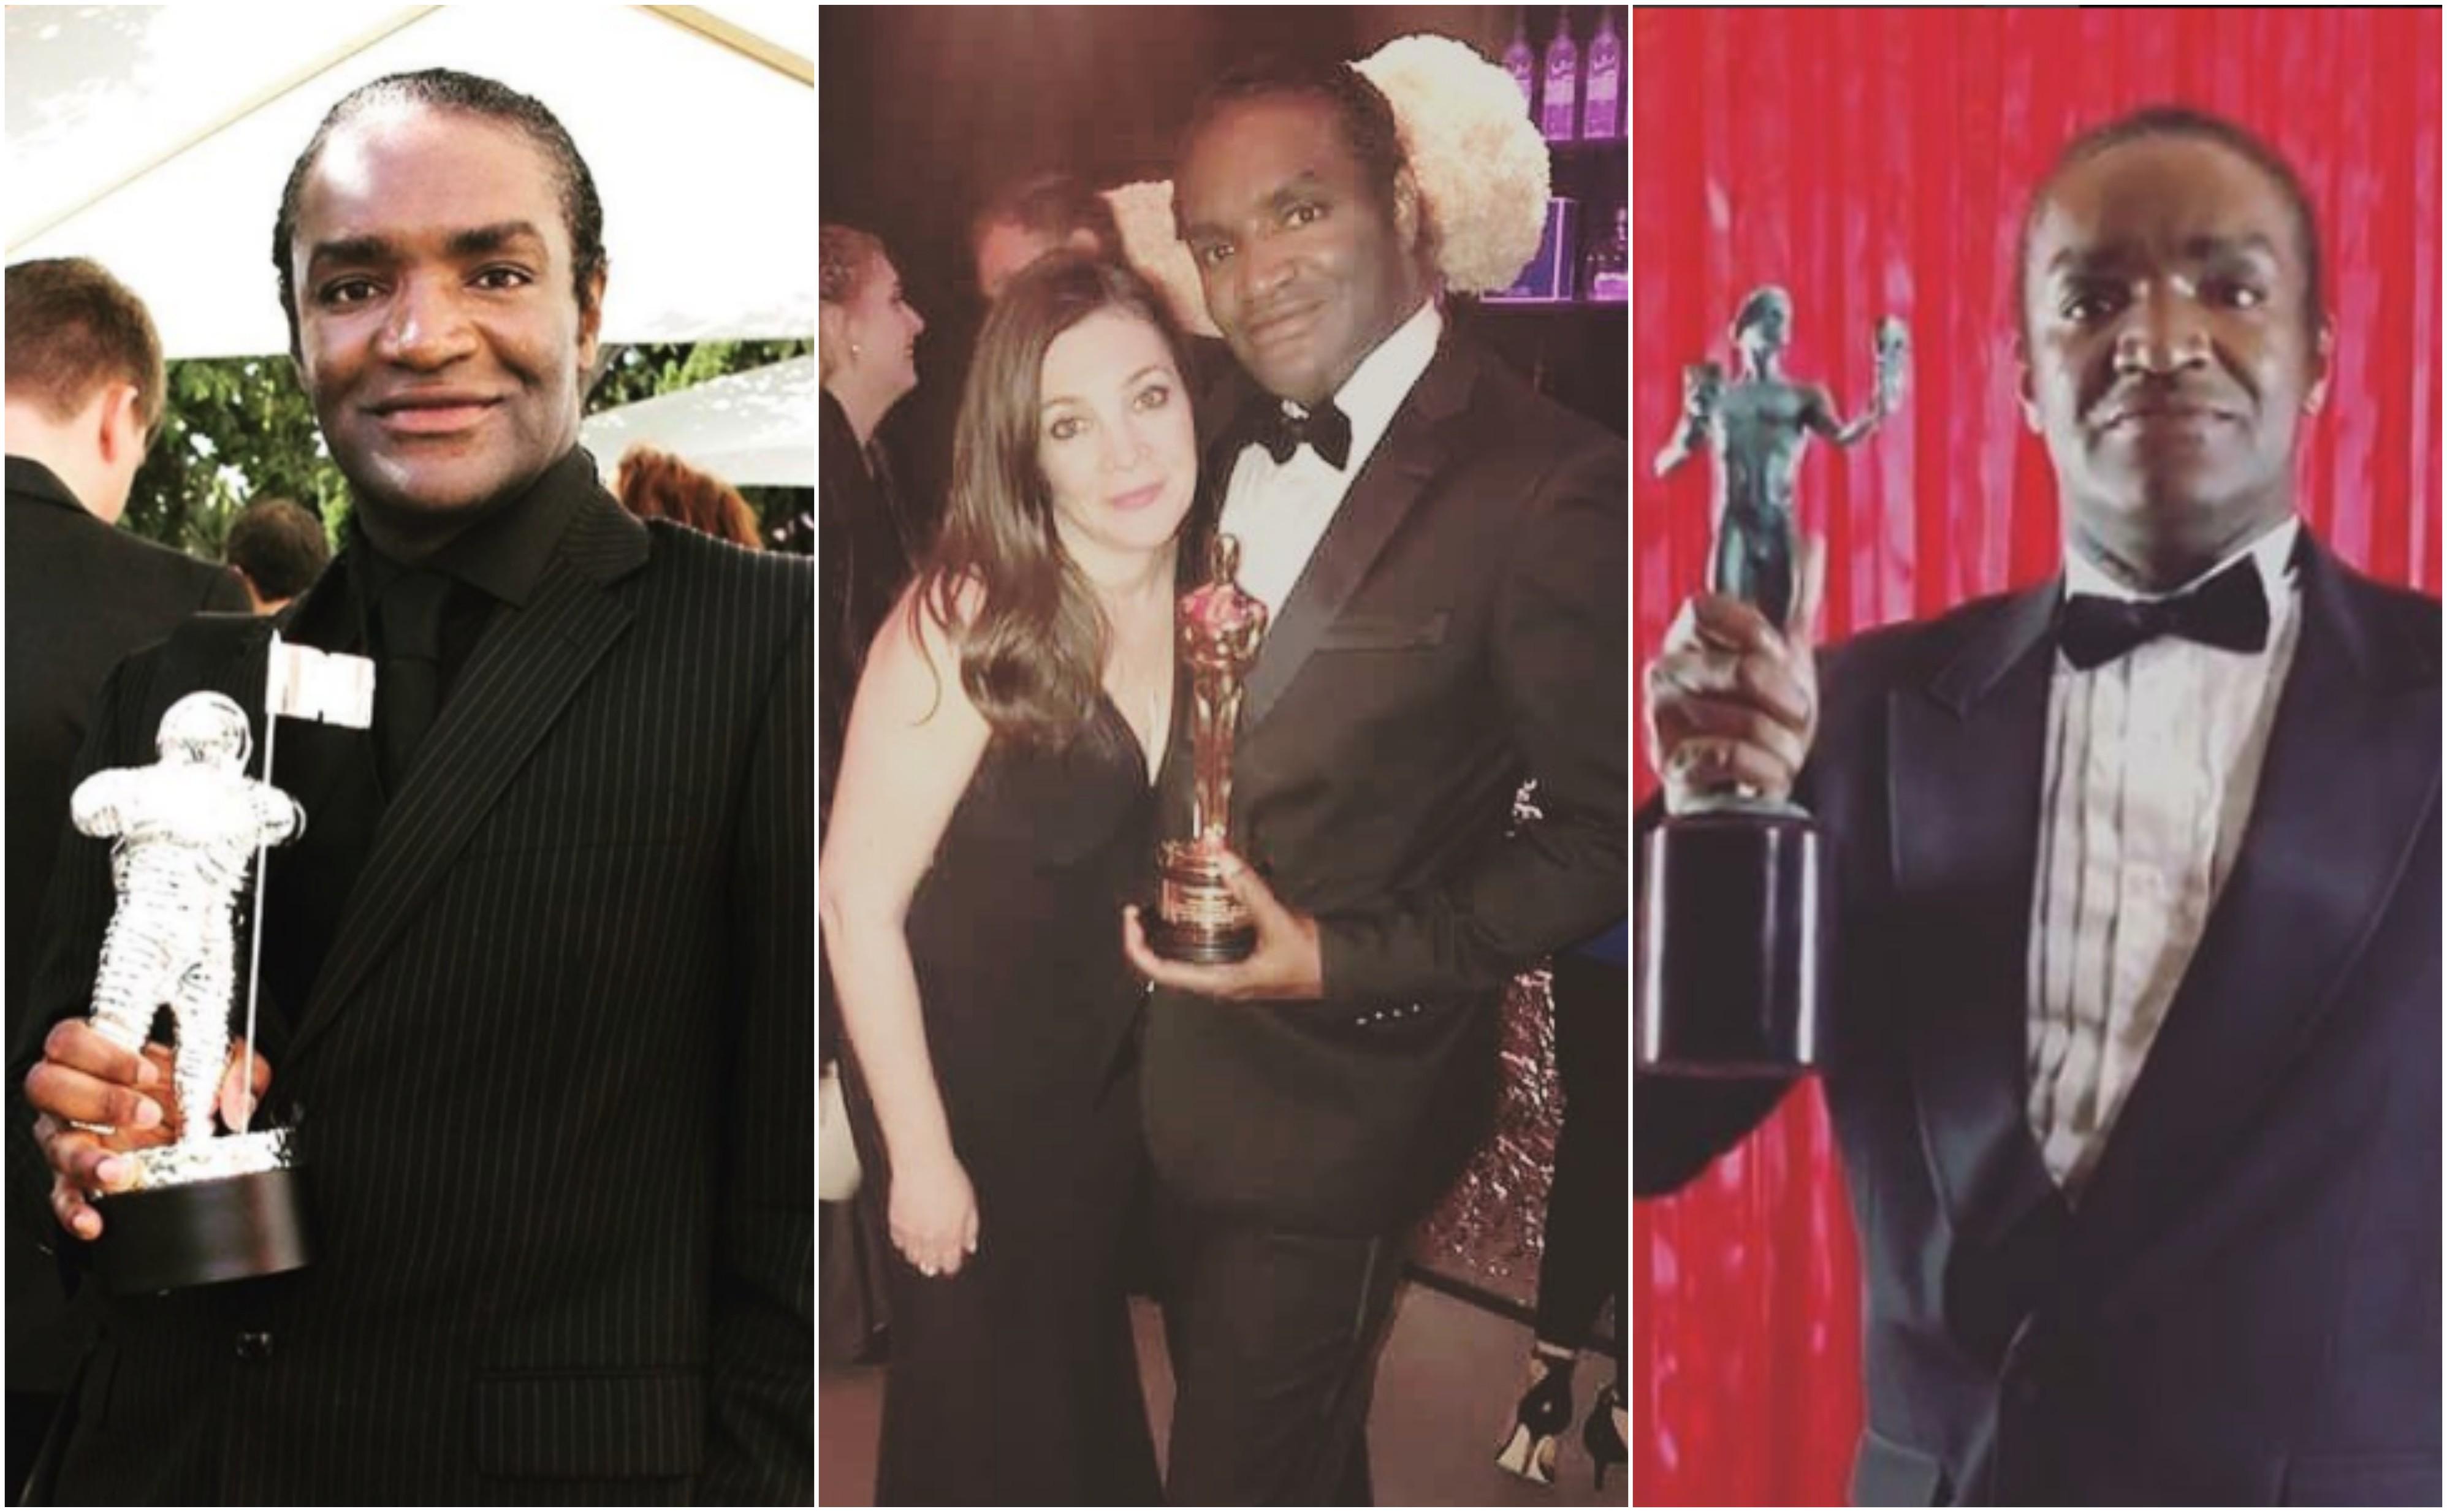 Terry Bryant MTV Video Music Awards Oscars SAG Awards